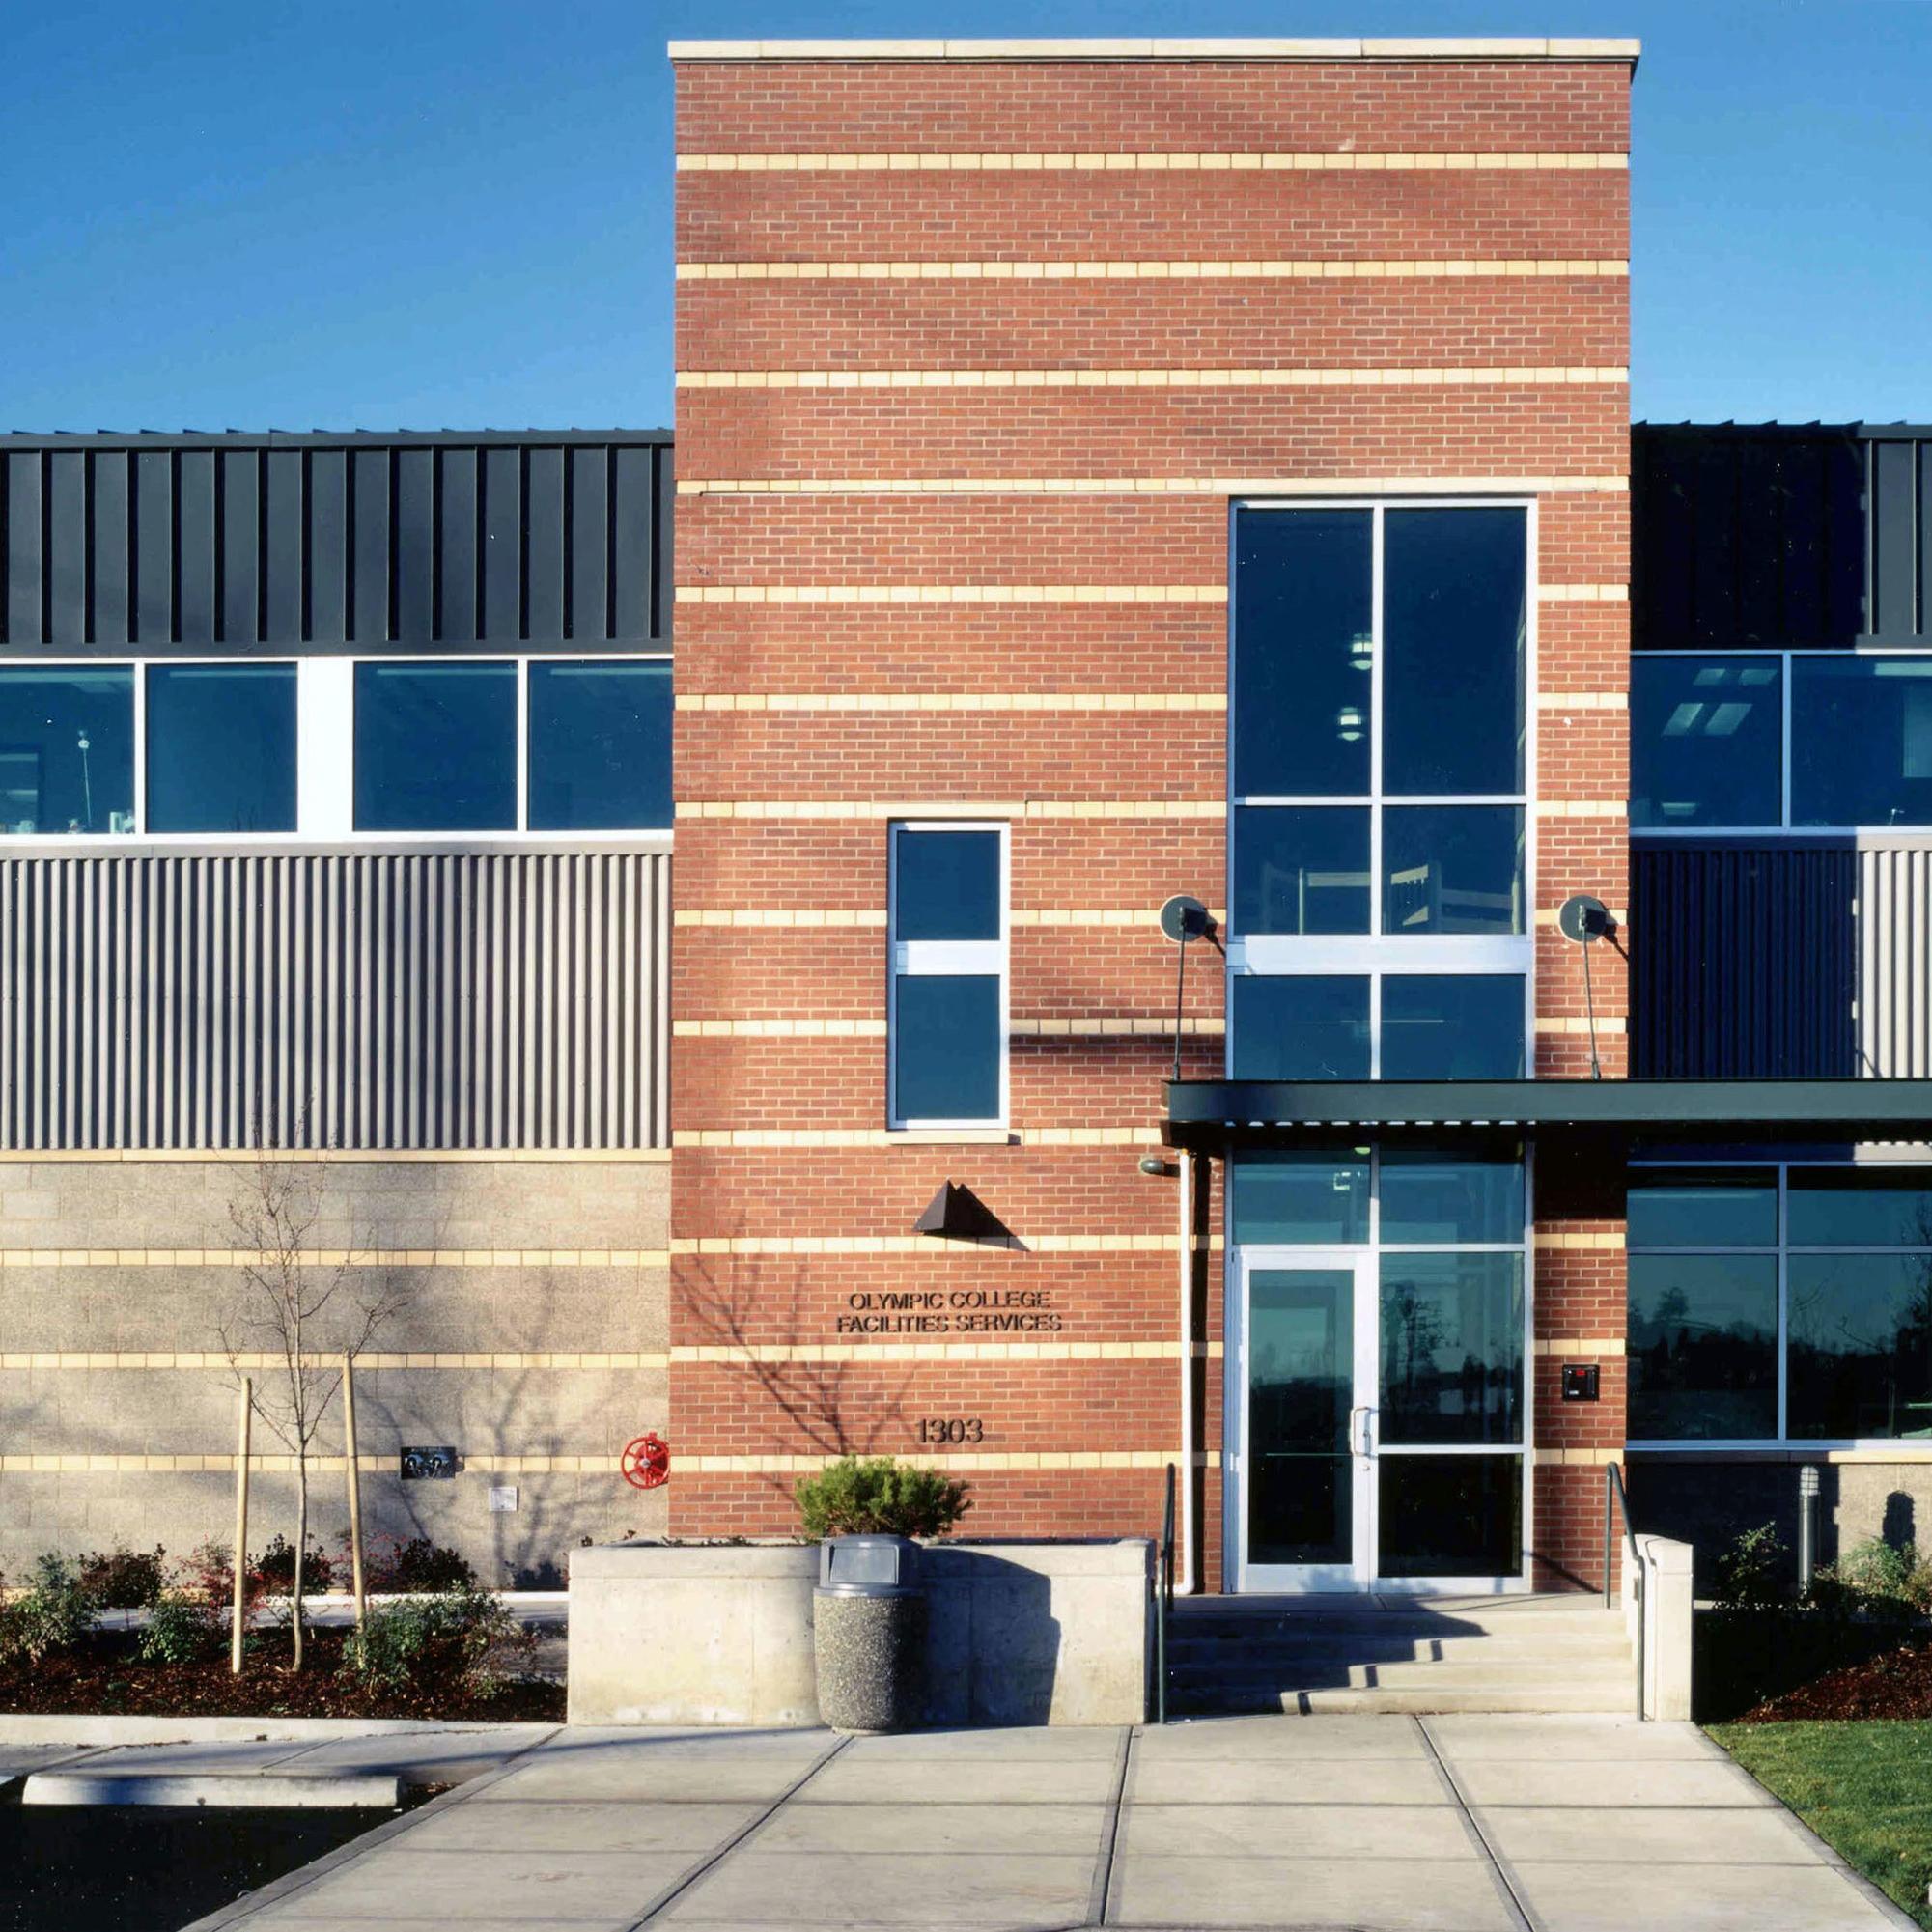 OC Physical Plant 107.jpg